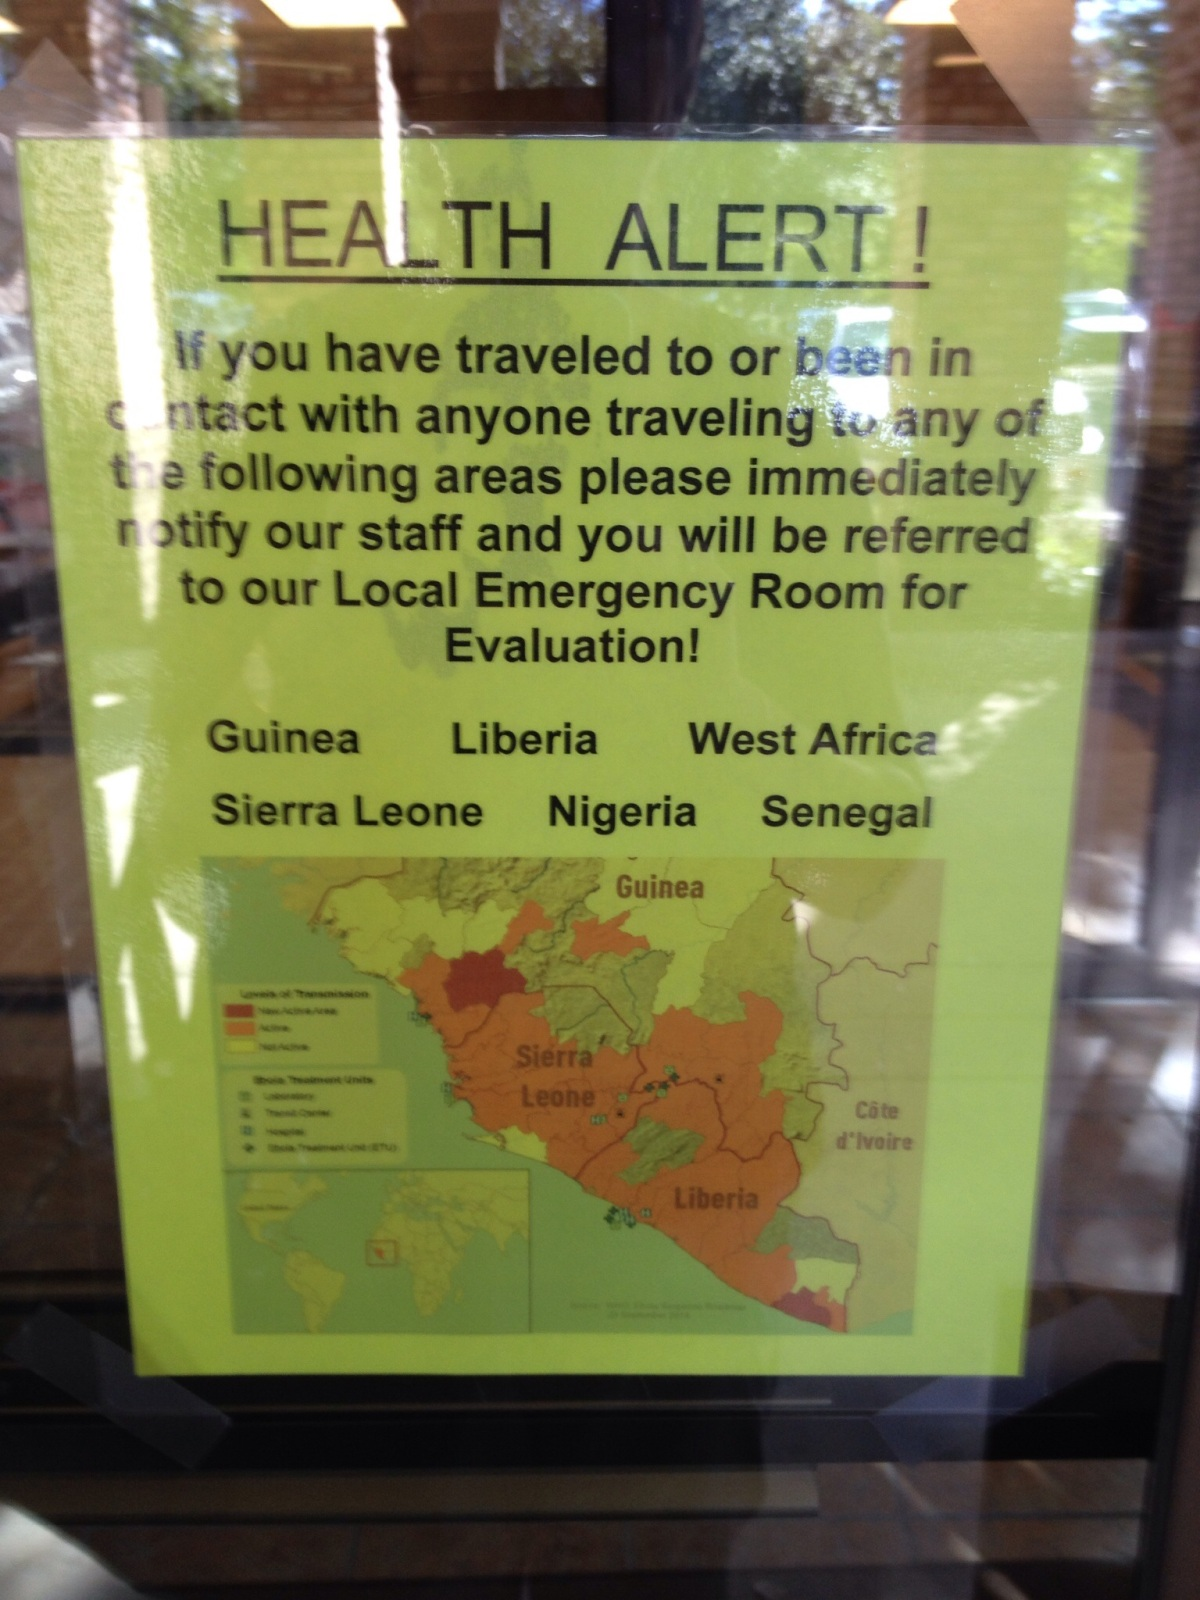 Health Alert!